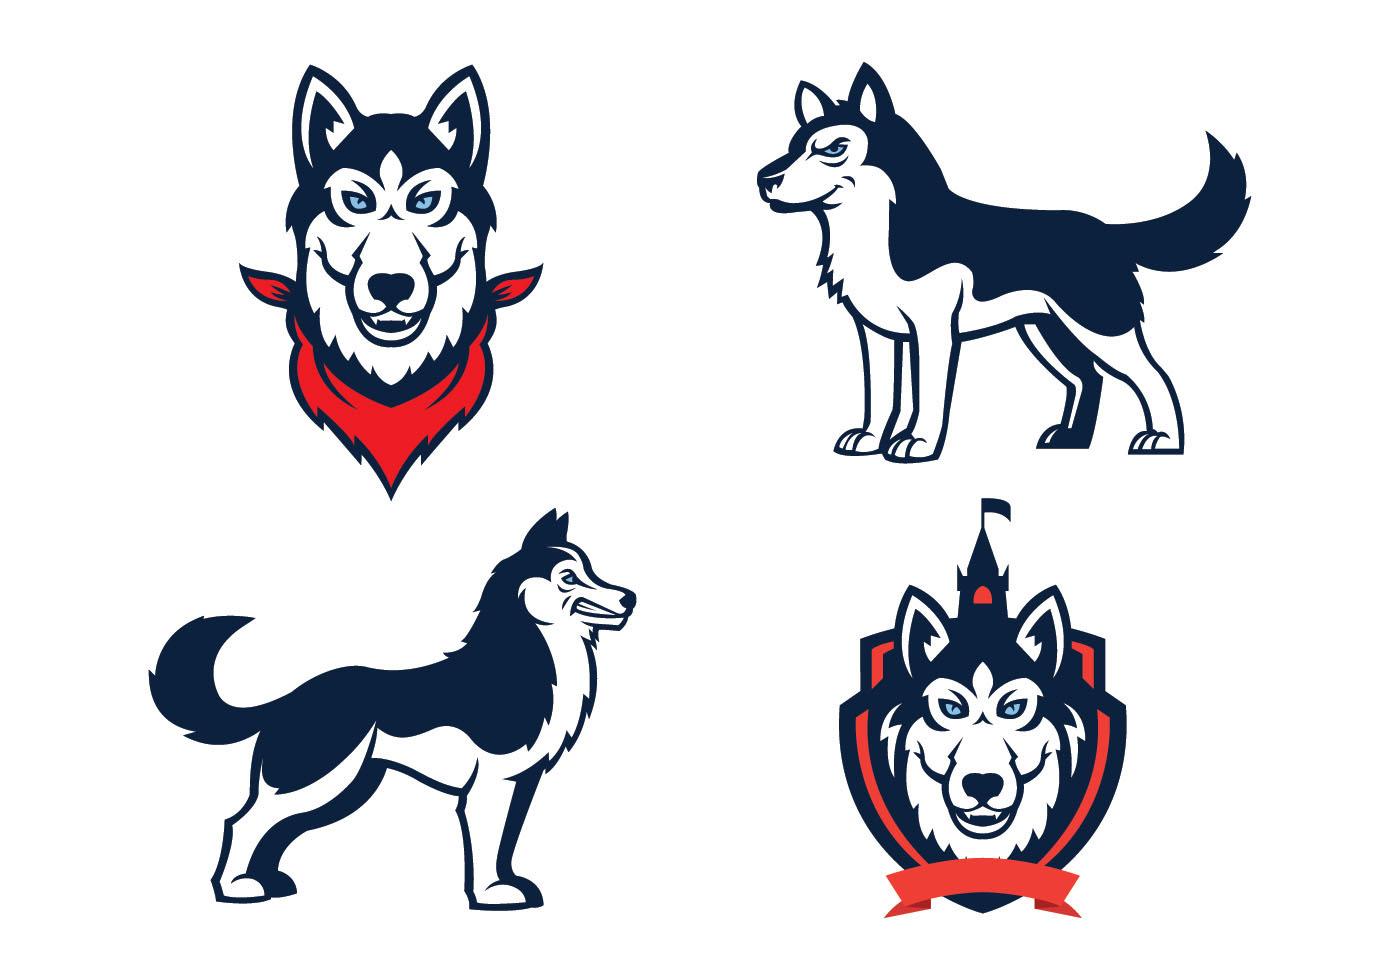 Dog Mascot Free Vector Art.